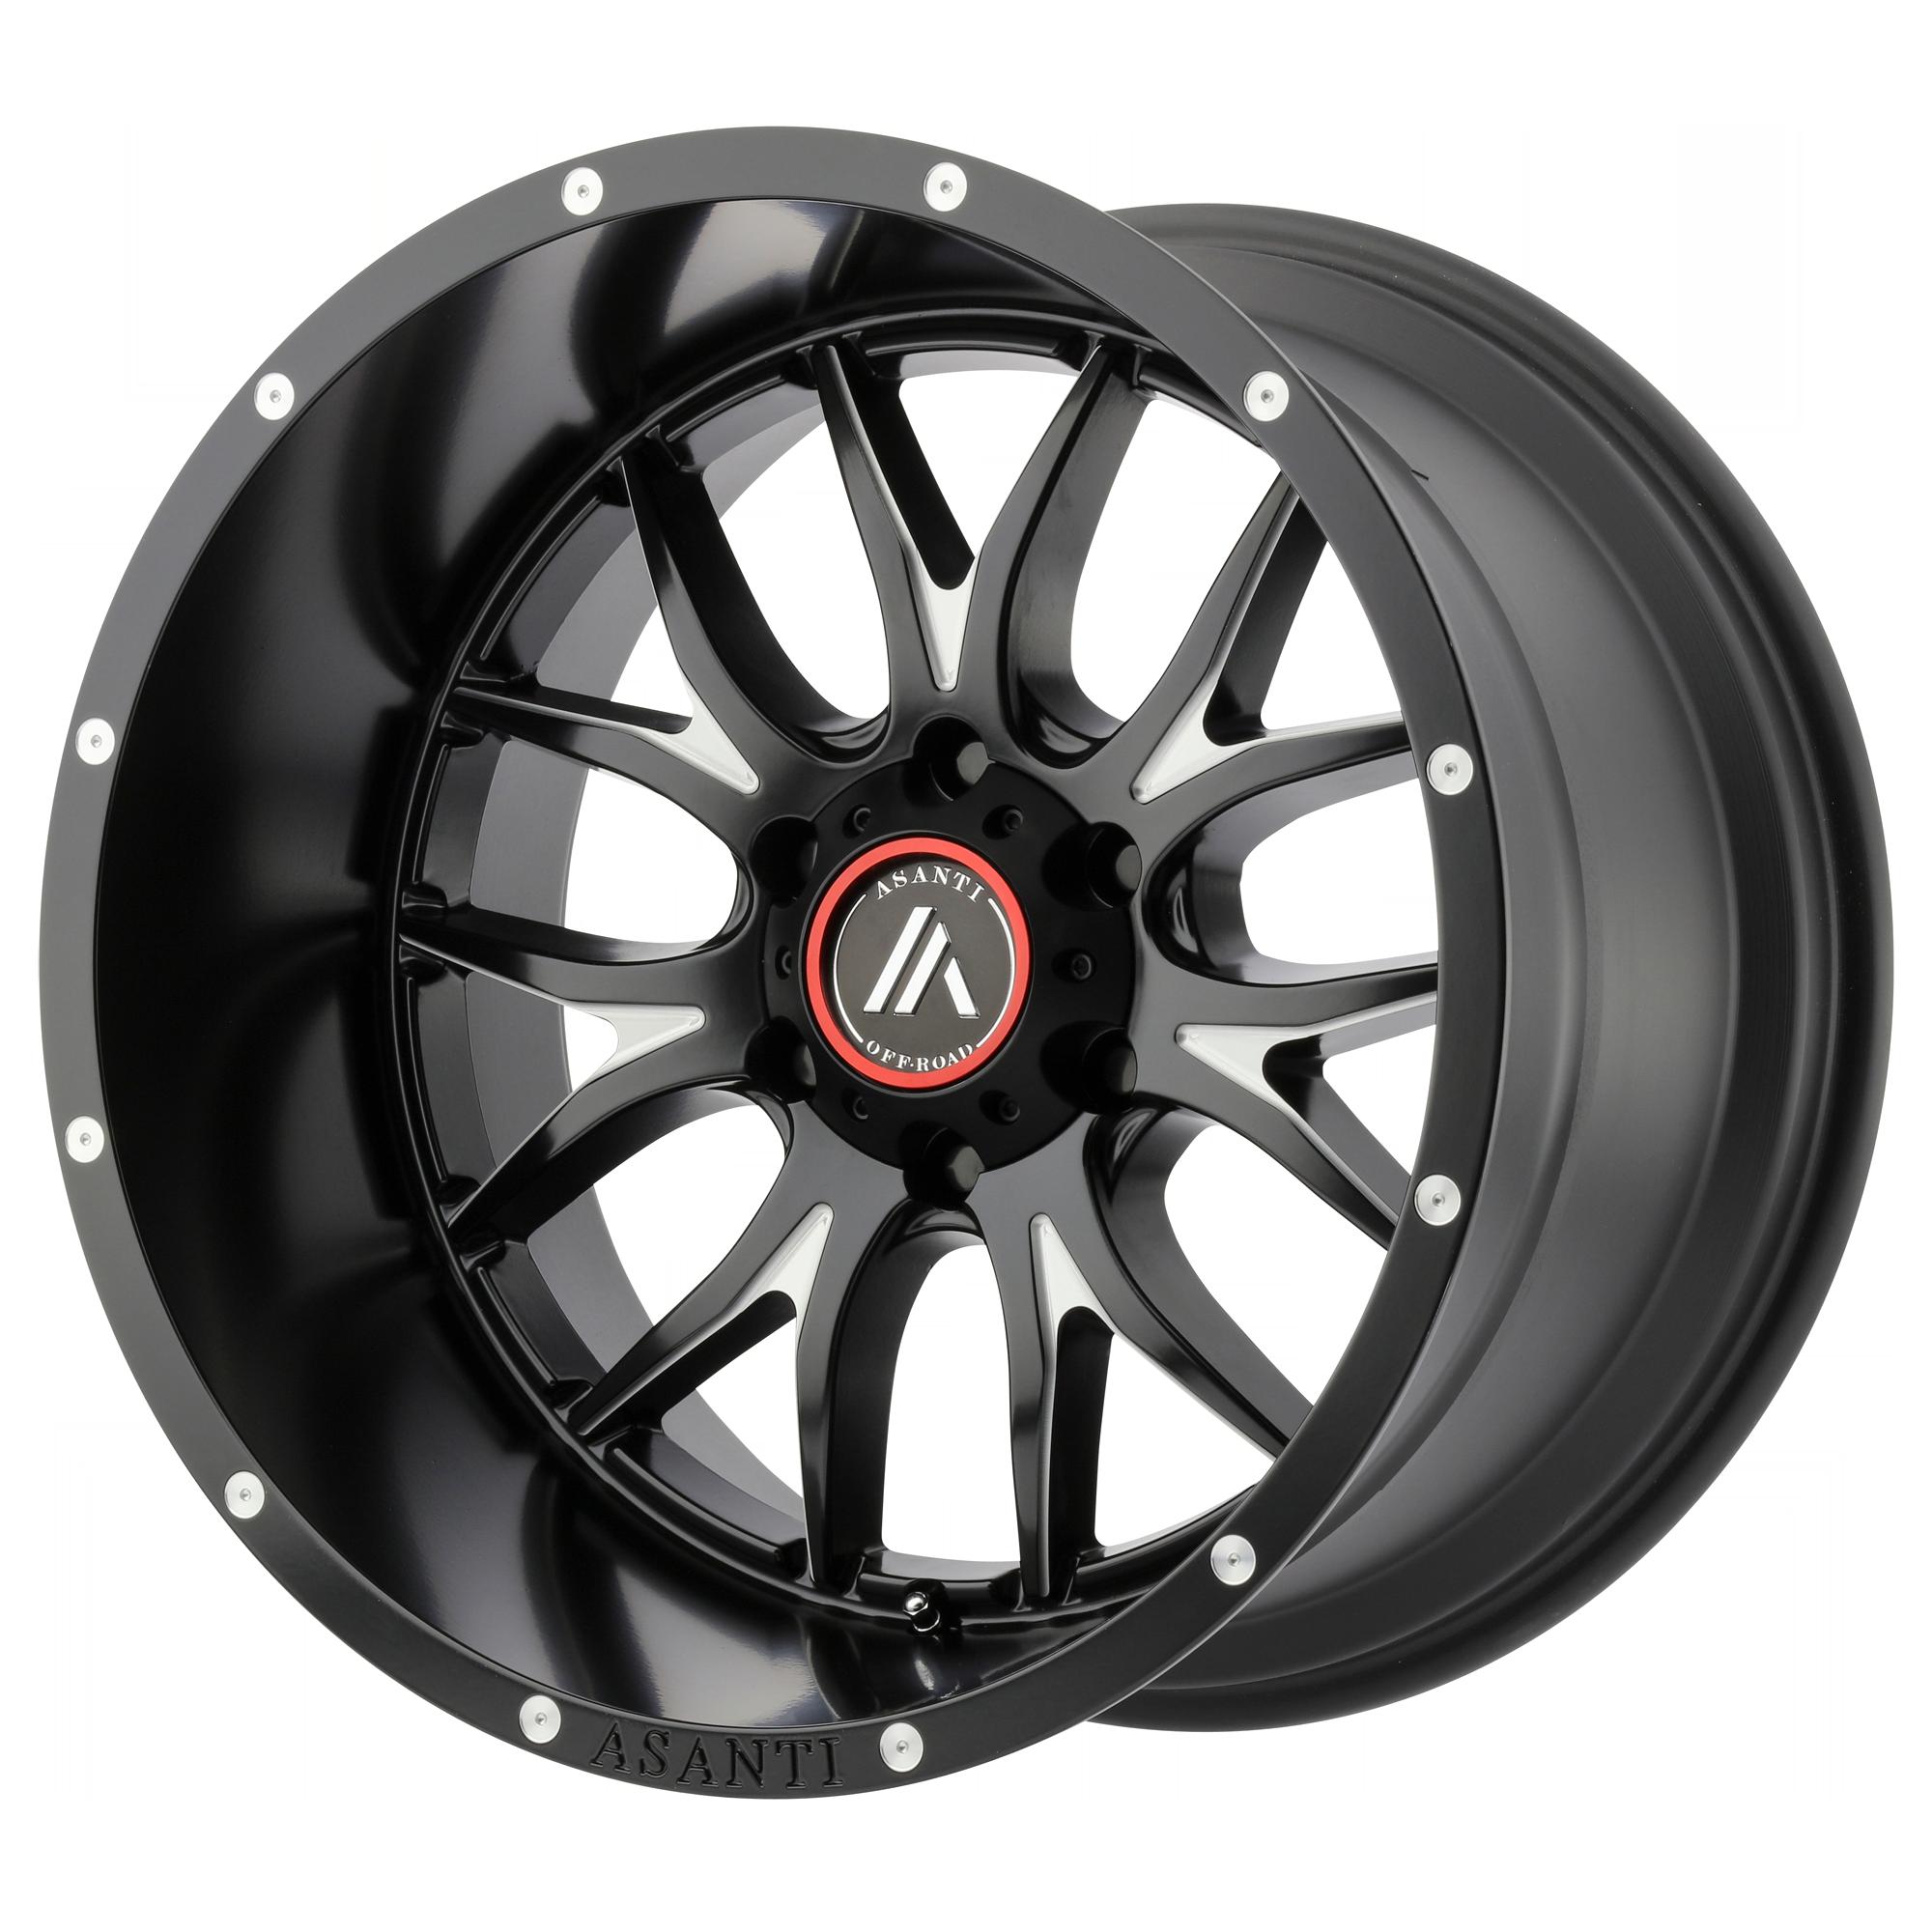 Asanti Off-Road Wheels AB807 Satin Black Milled